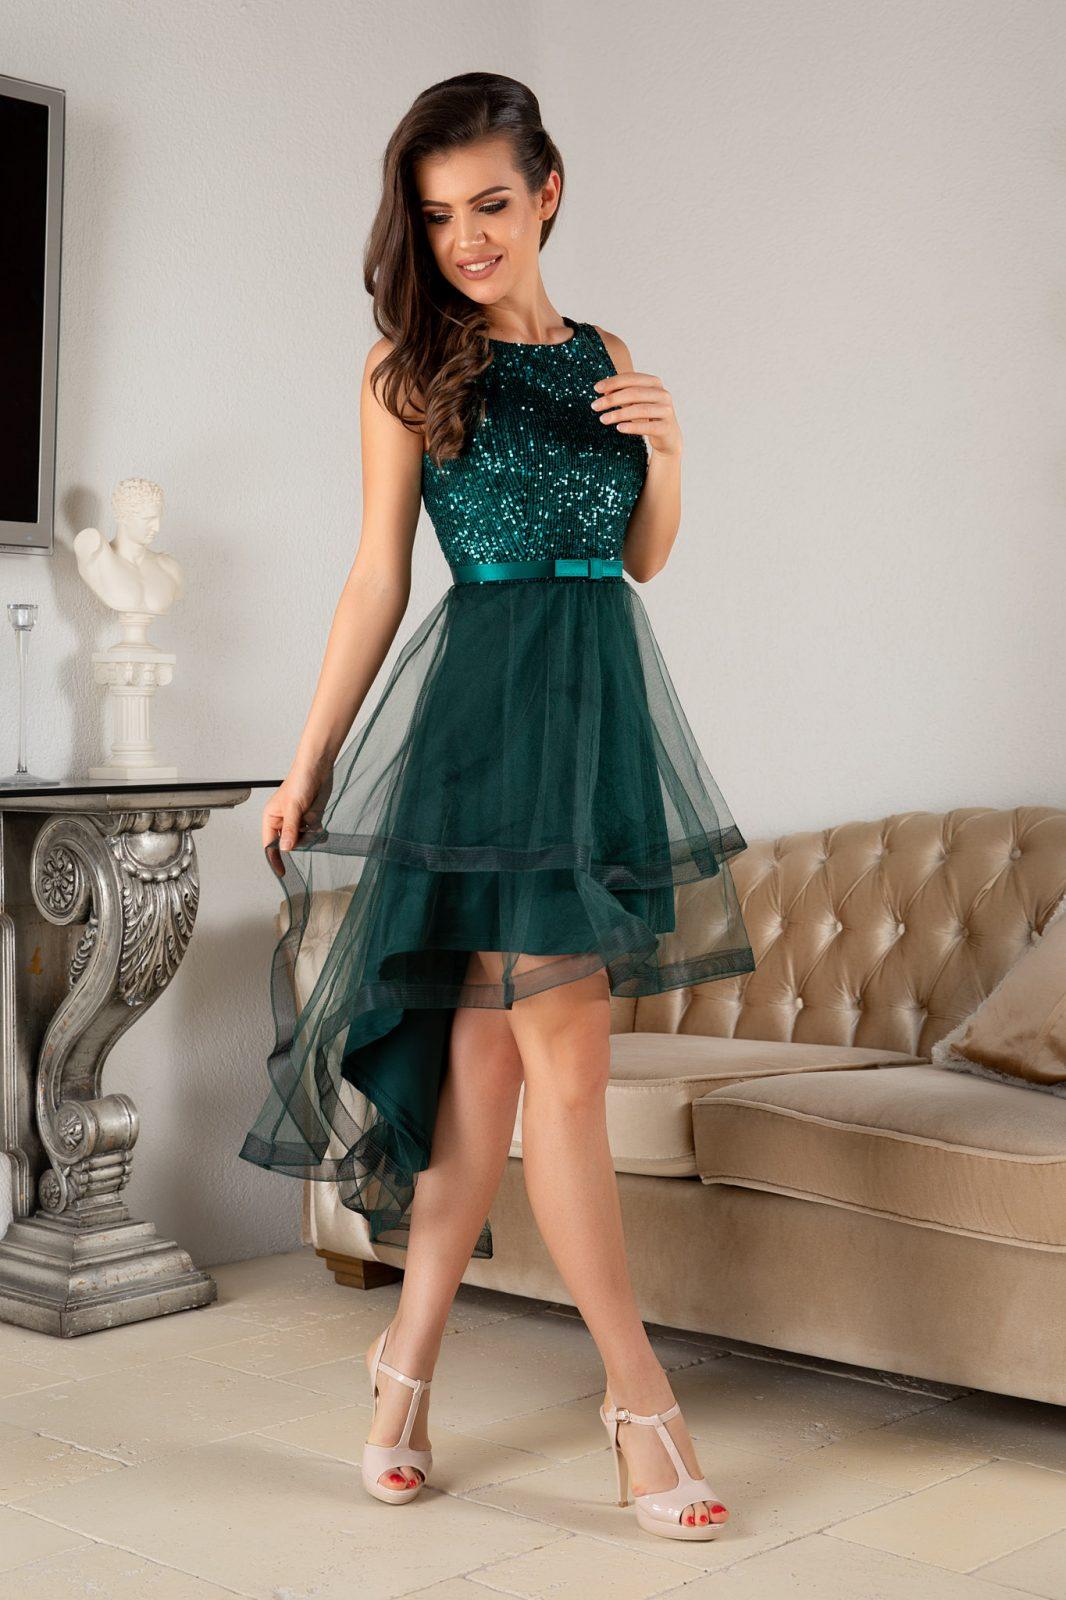 Queeny Green Dress